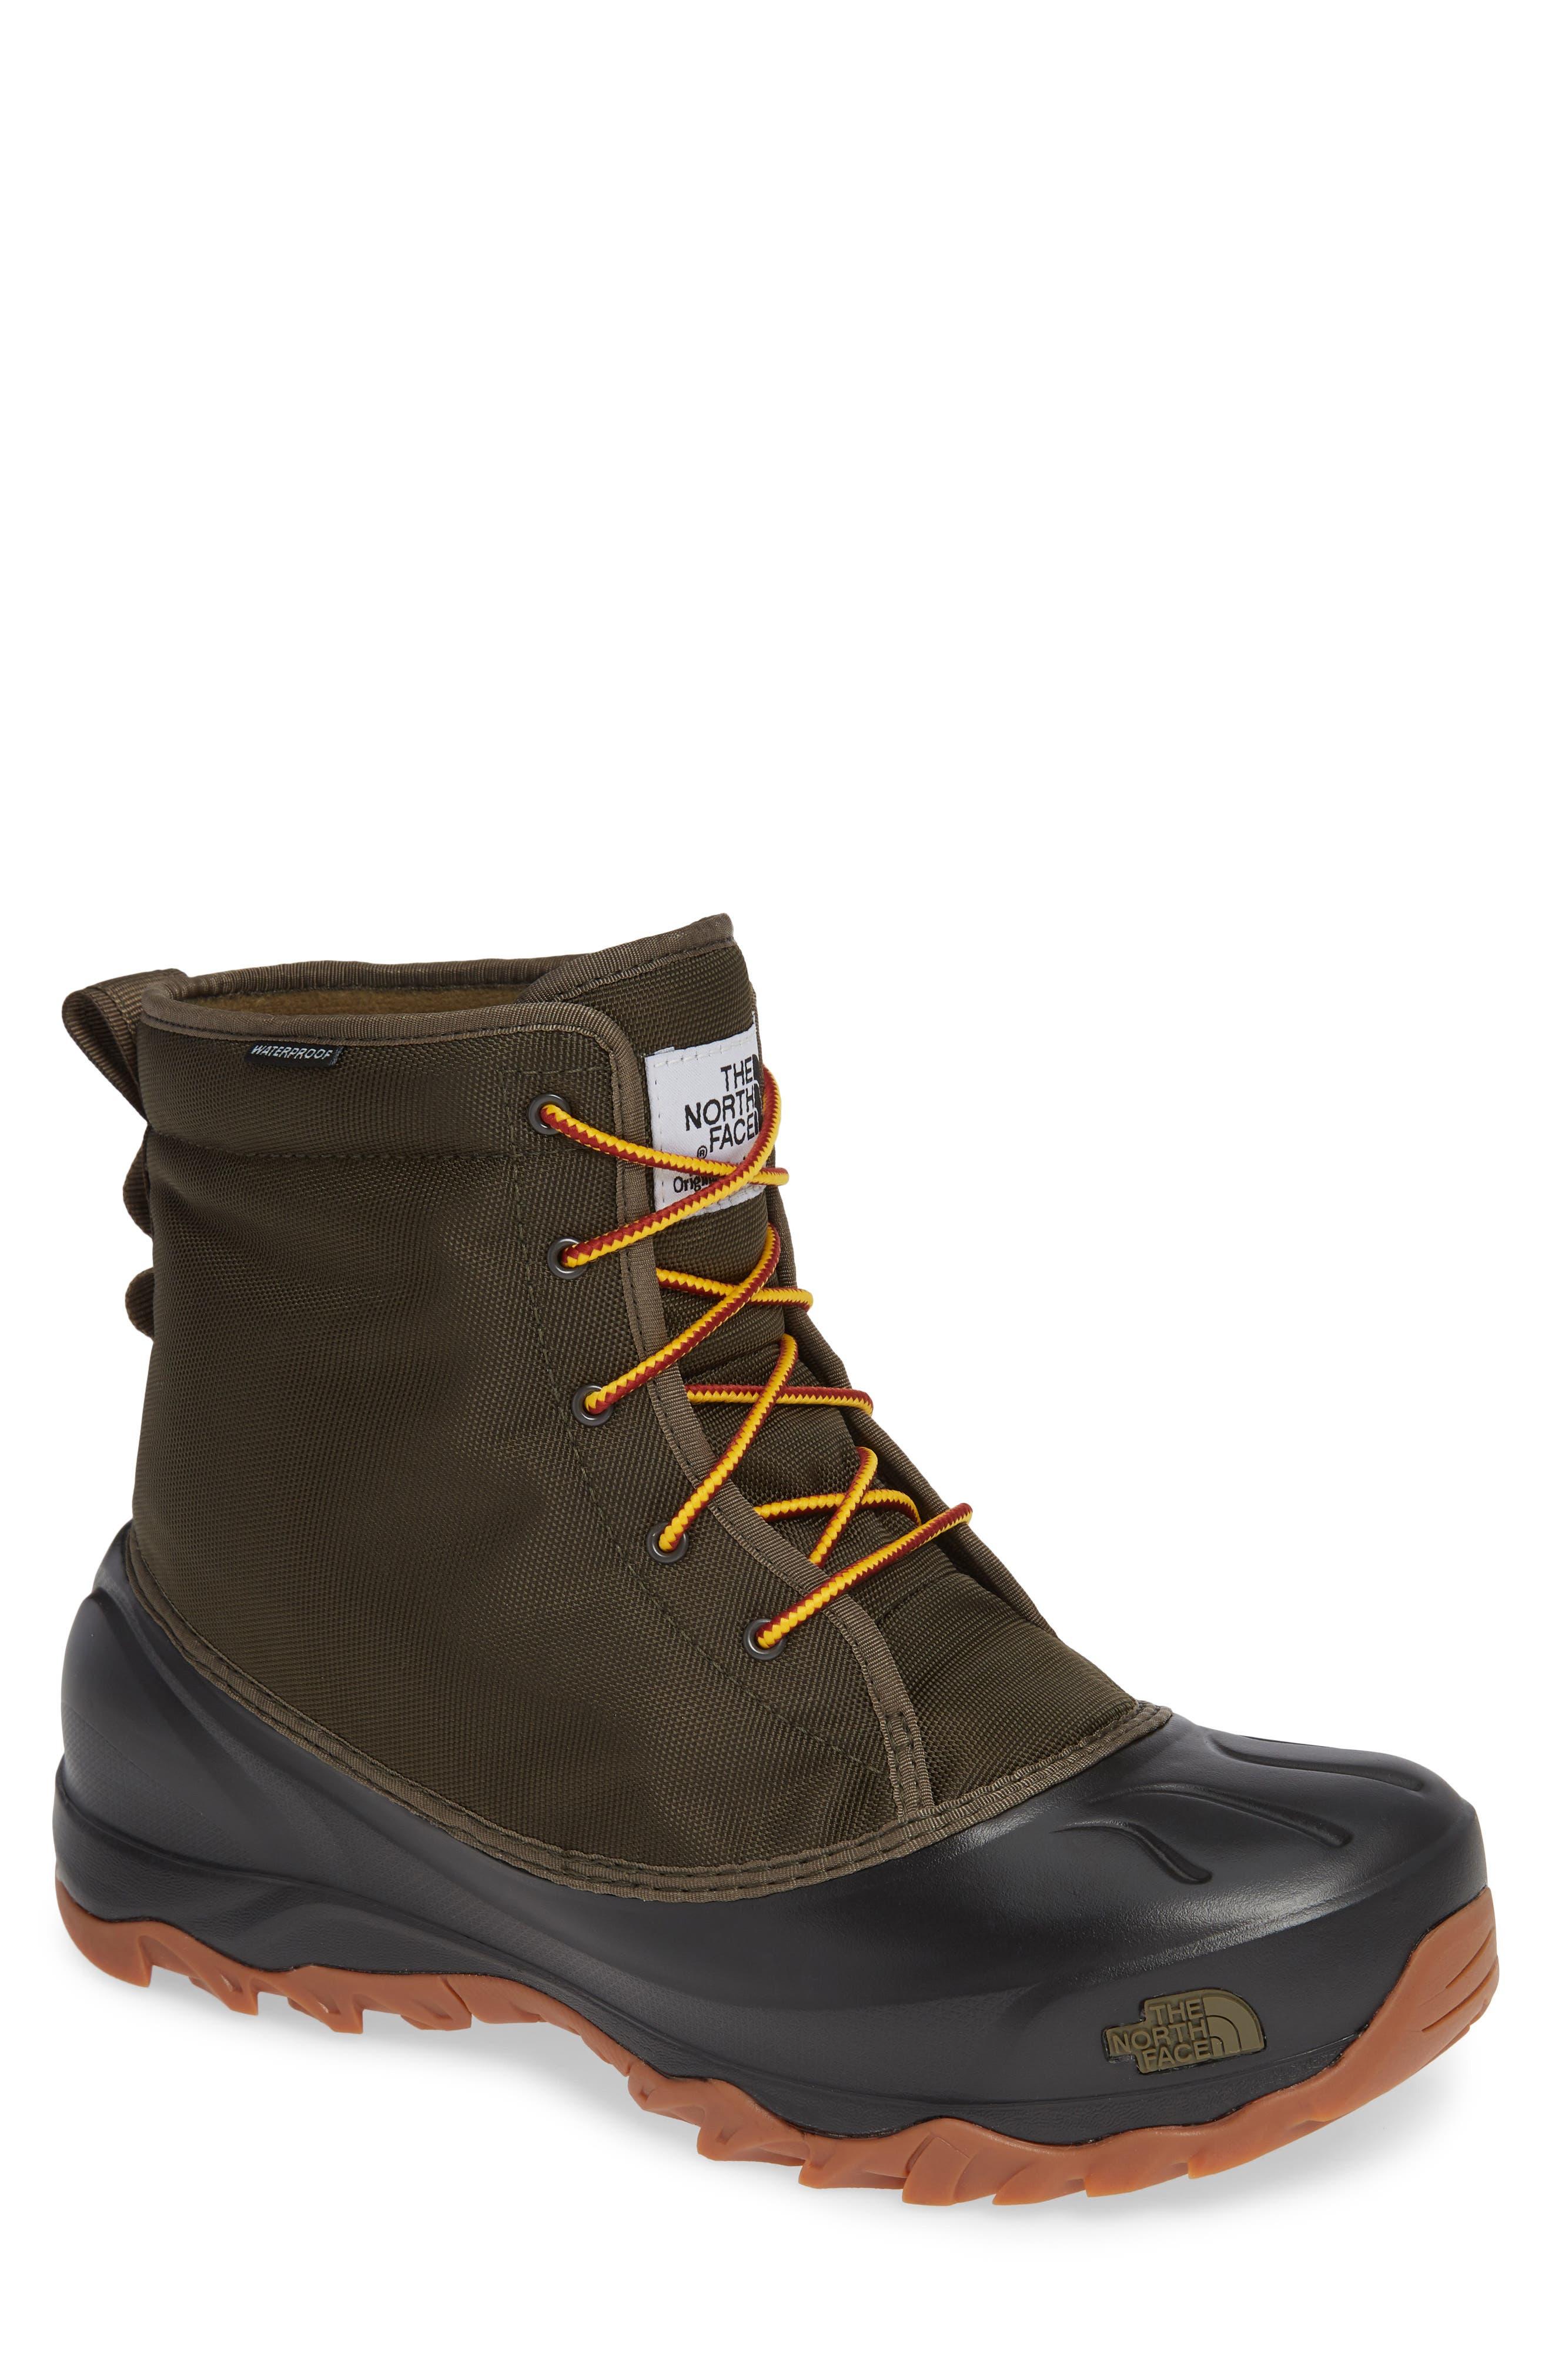 The North Face Tsumoru Snow Waterproof Boot, Green